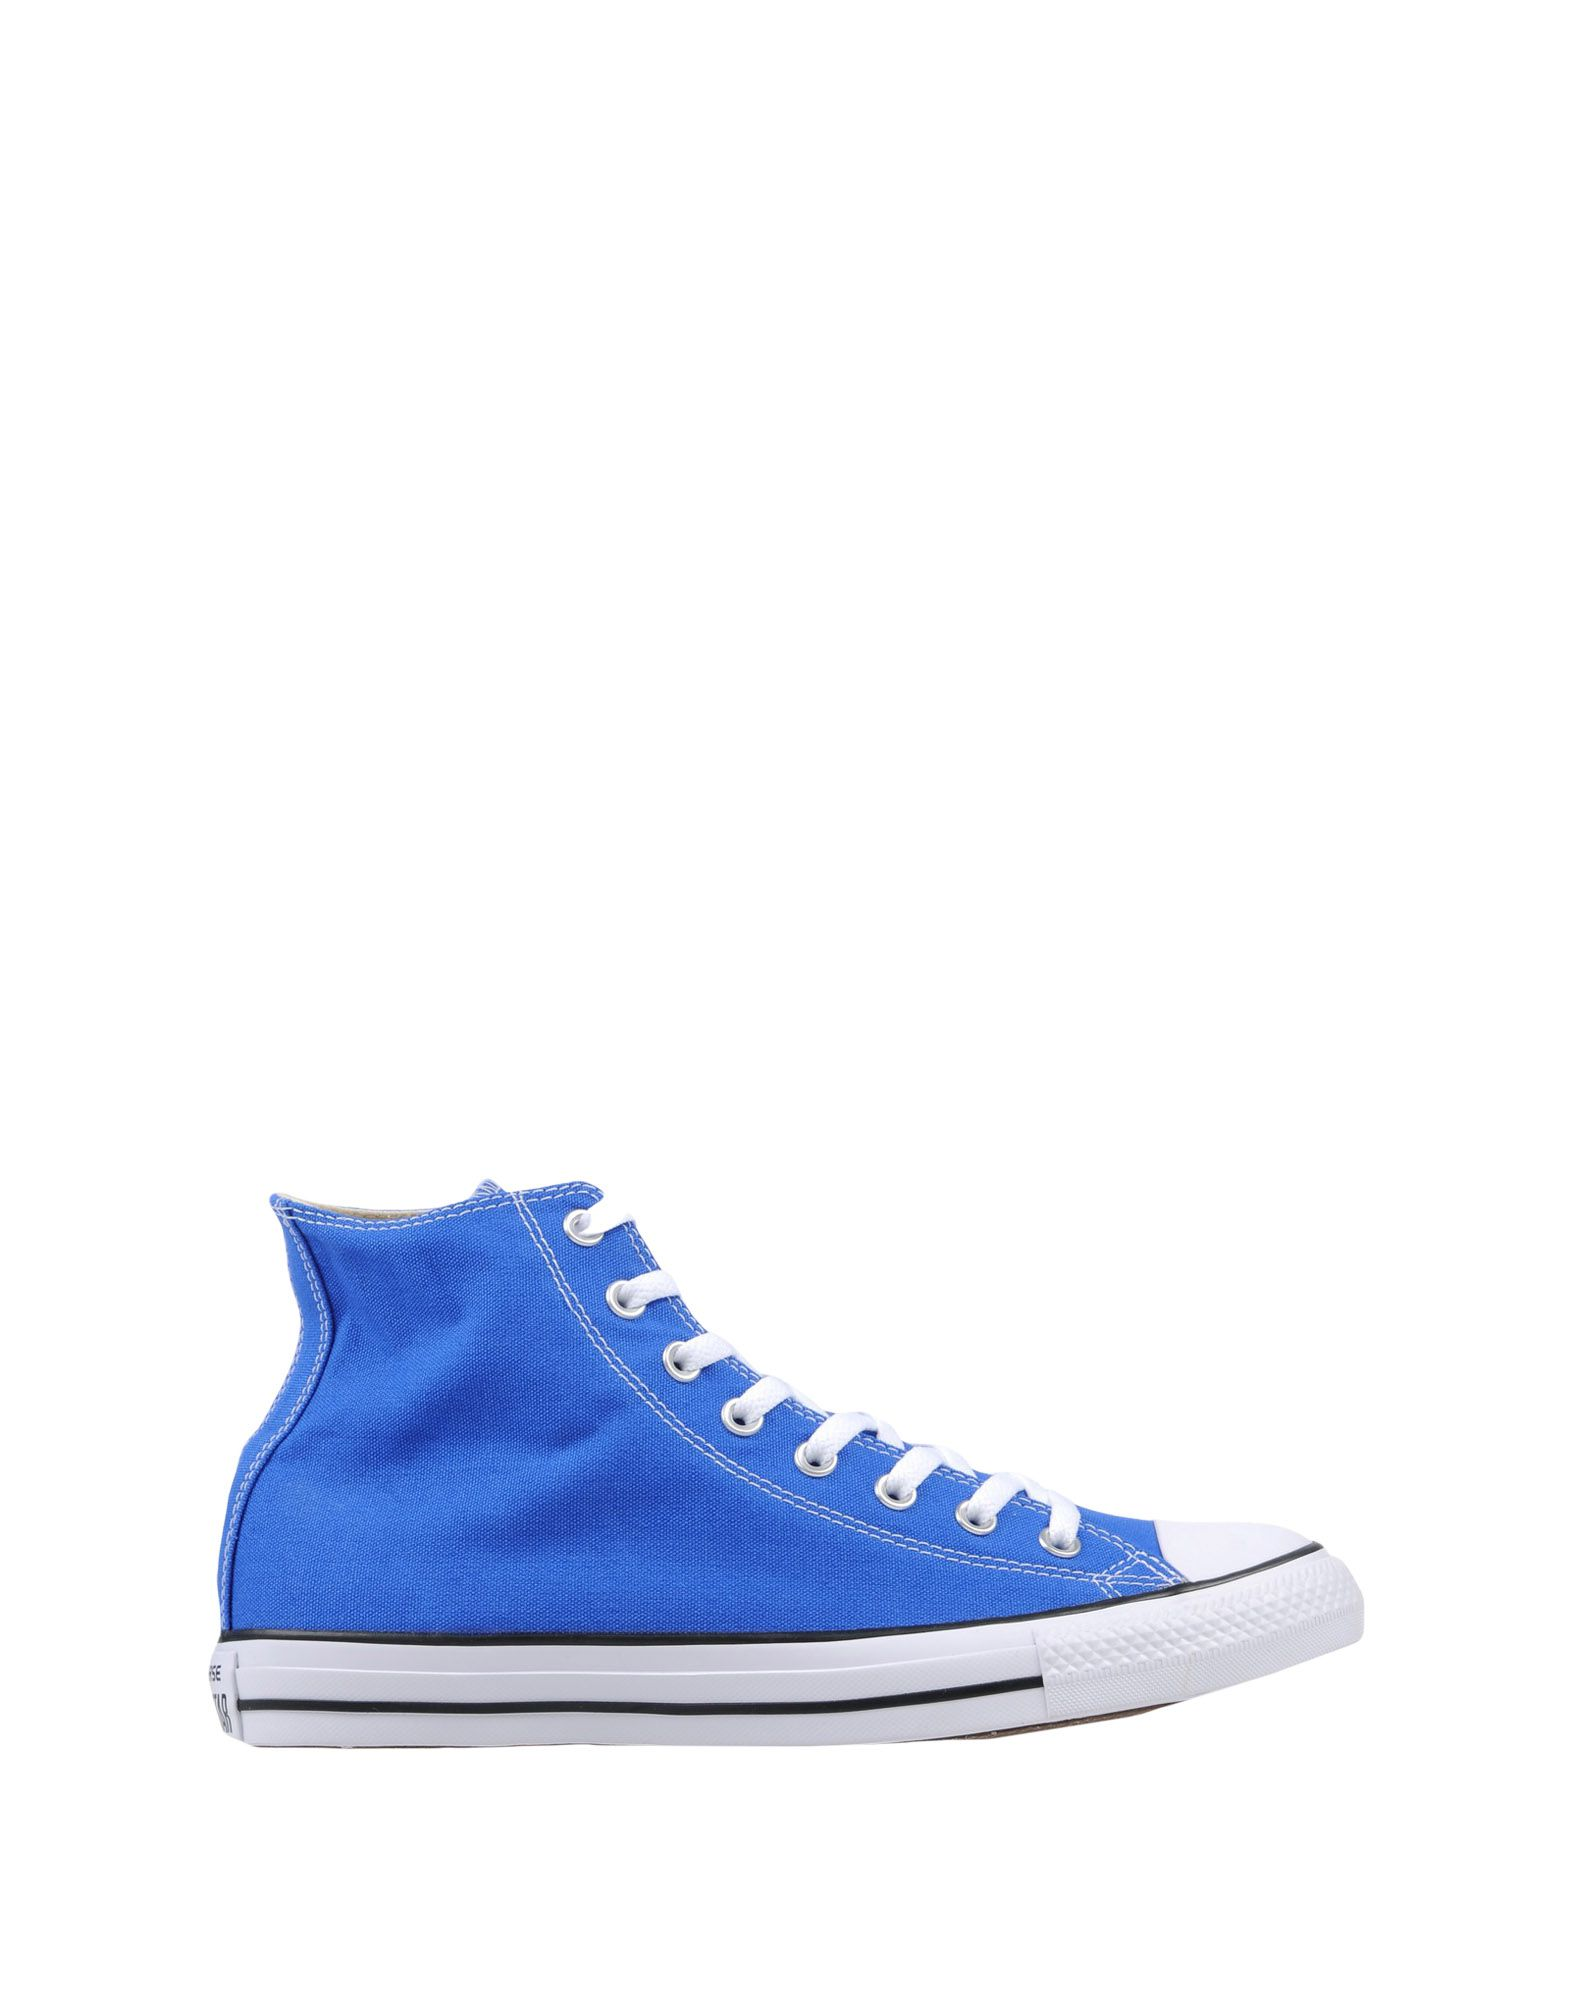 Converse All Star Ctas Hi  Canvas Seasonal Colors  Hi 11437500RL Heiße Schuhe d67223